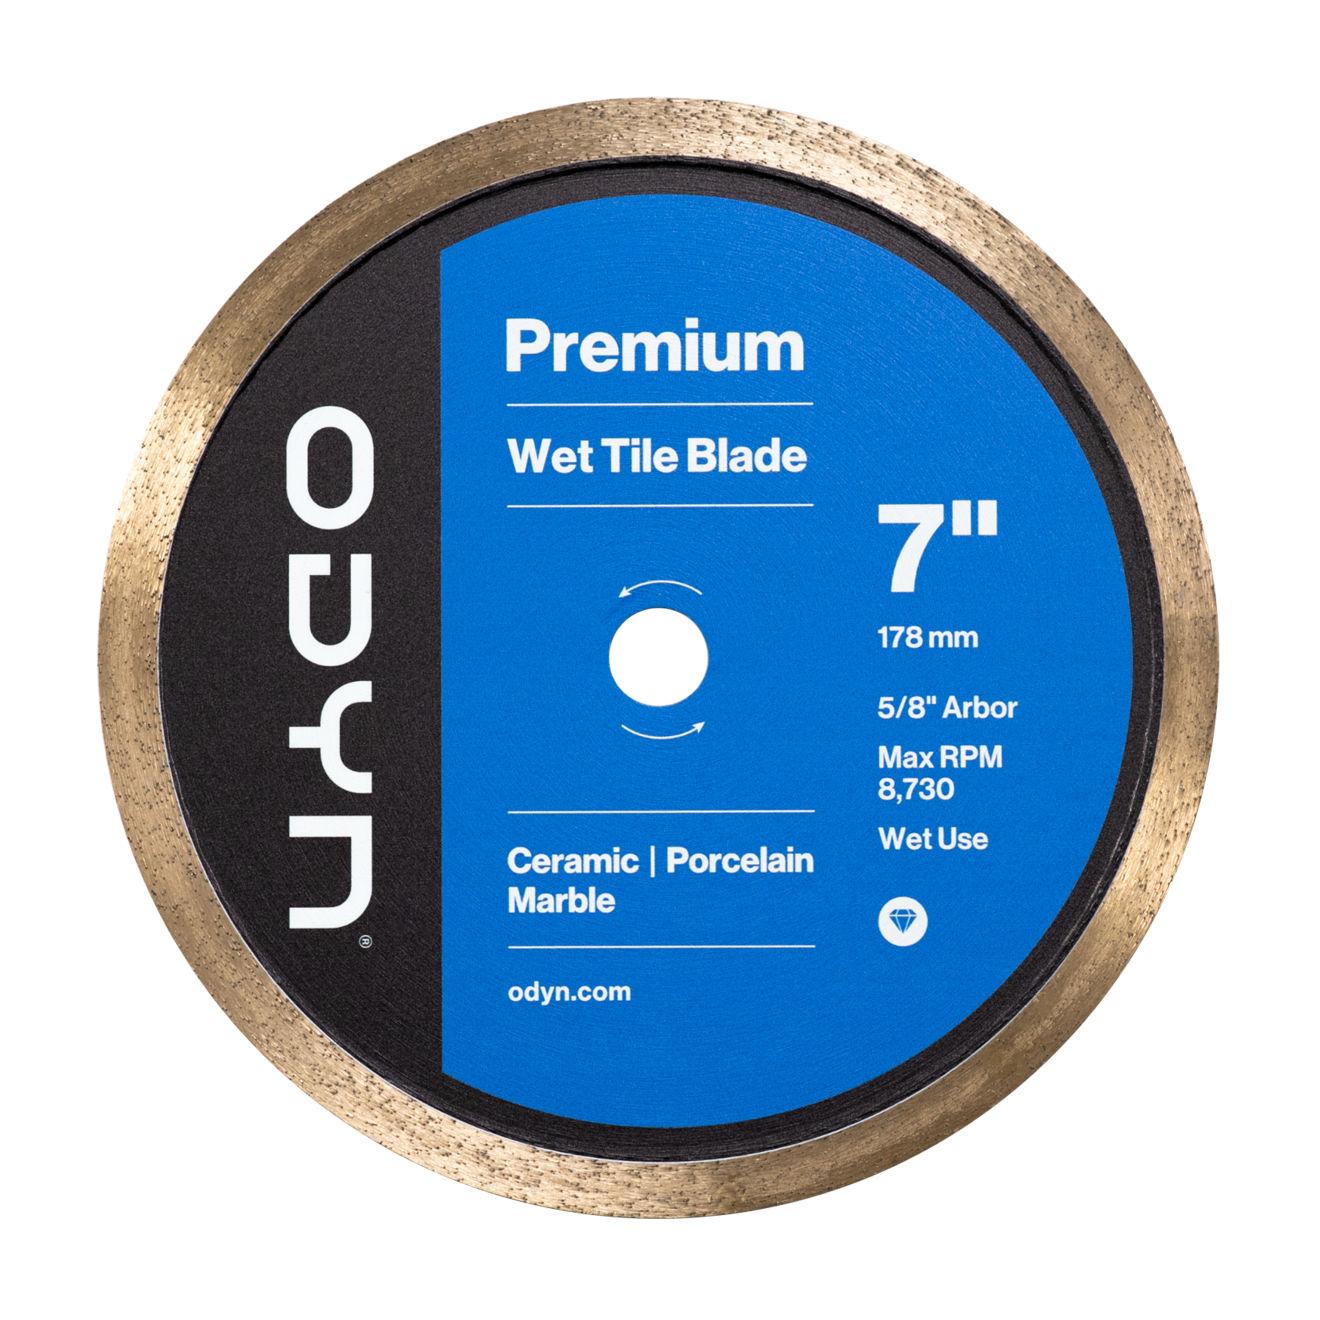 Odyn 7 in. Premium Wet Tile Blade